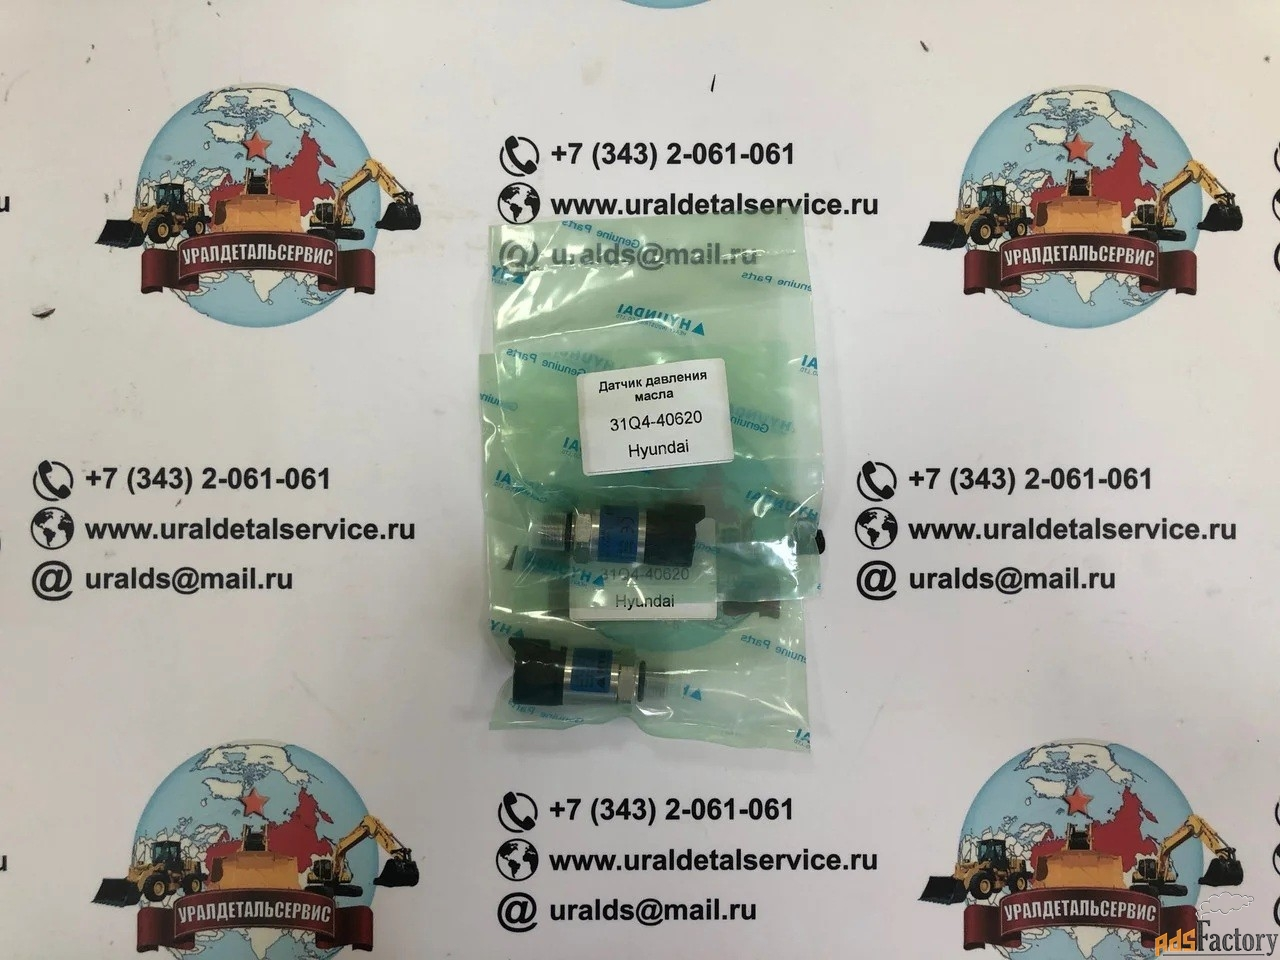 датчик давления масла (50 бар) hyundai 31q4-40620